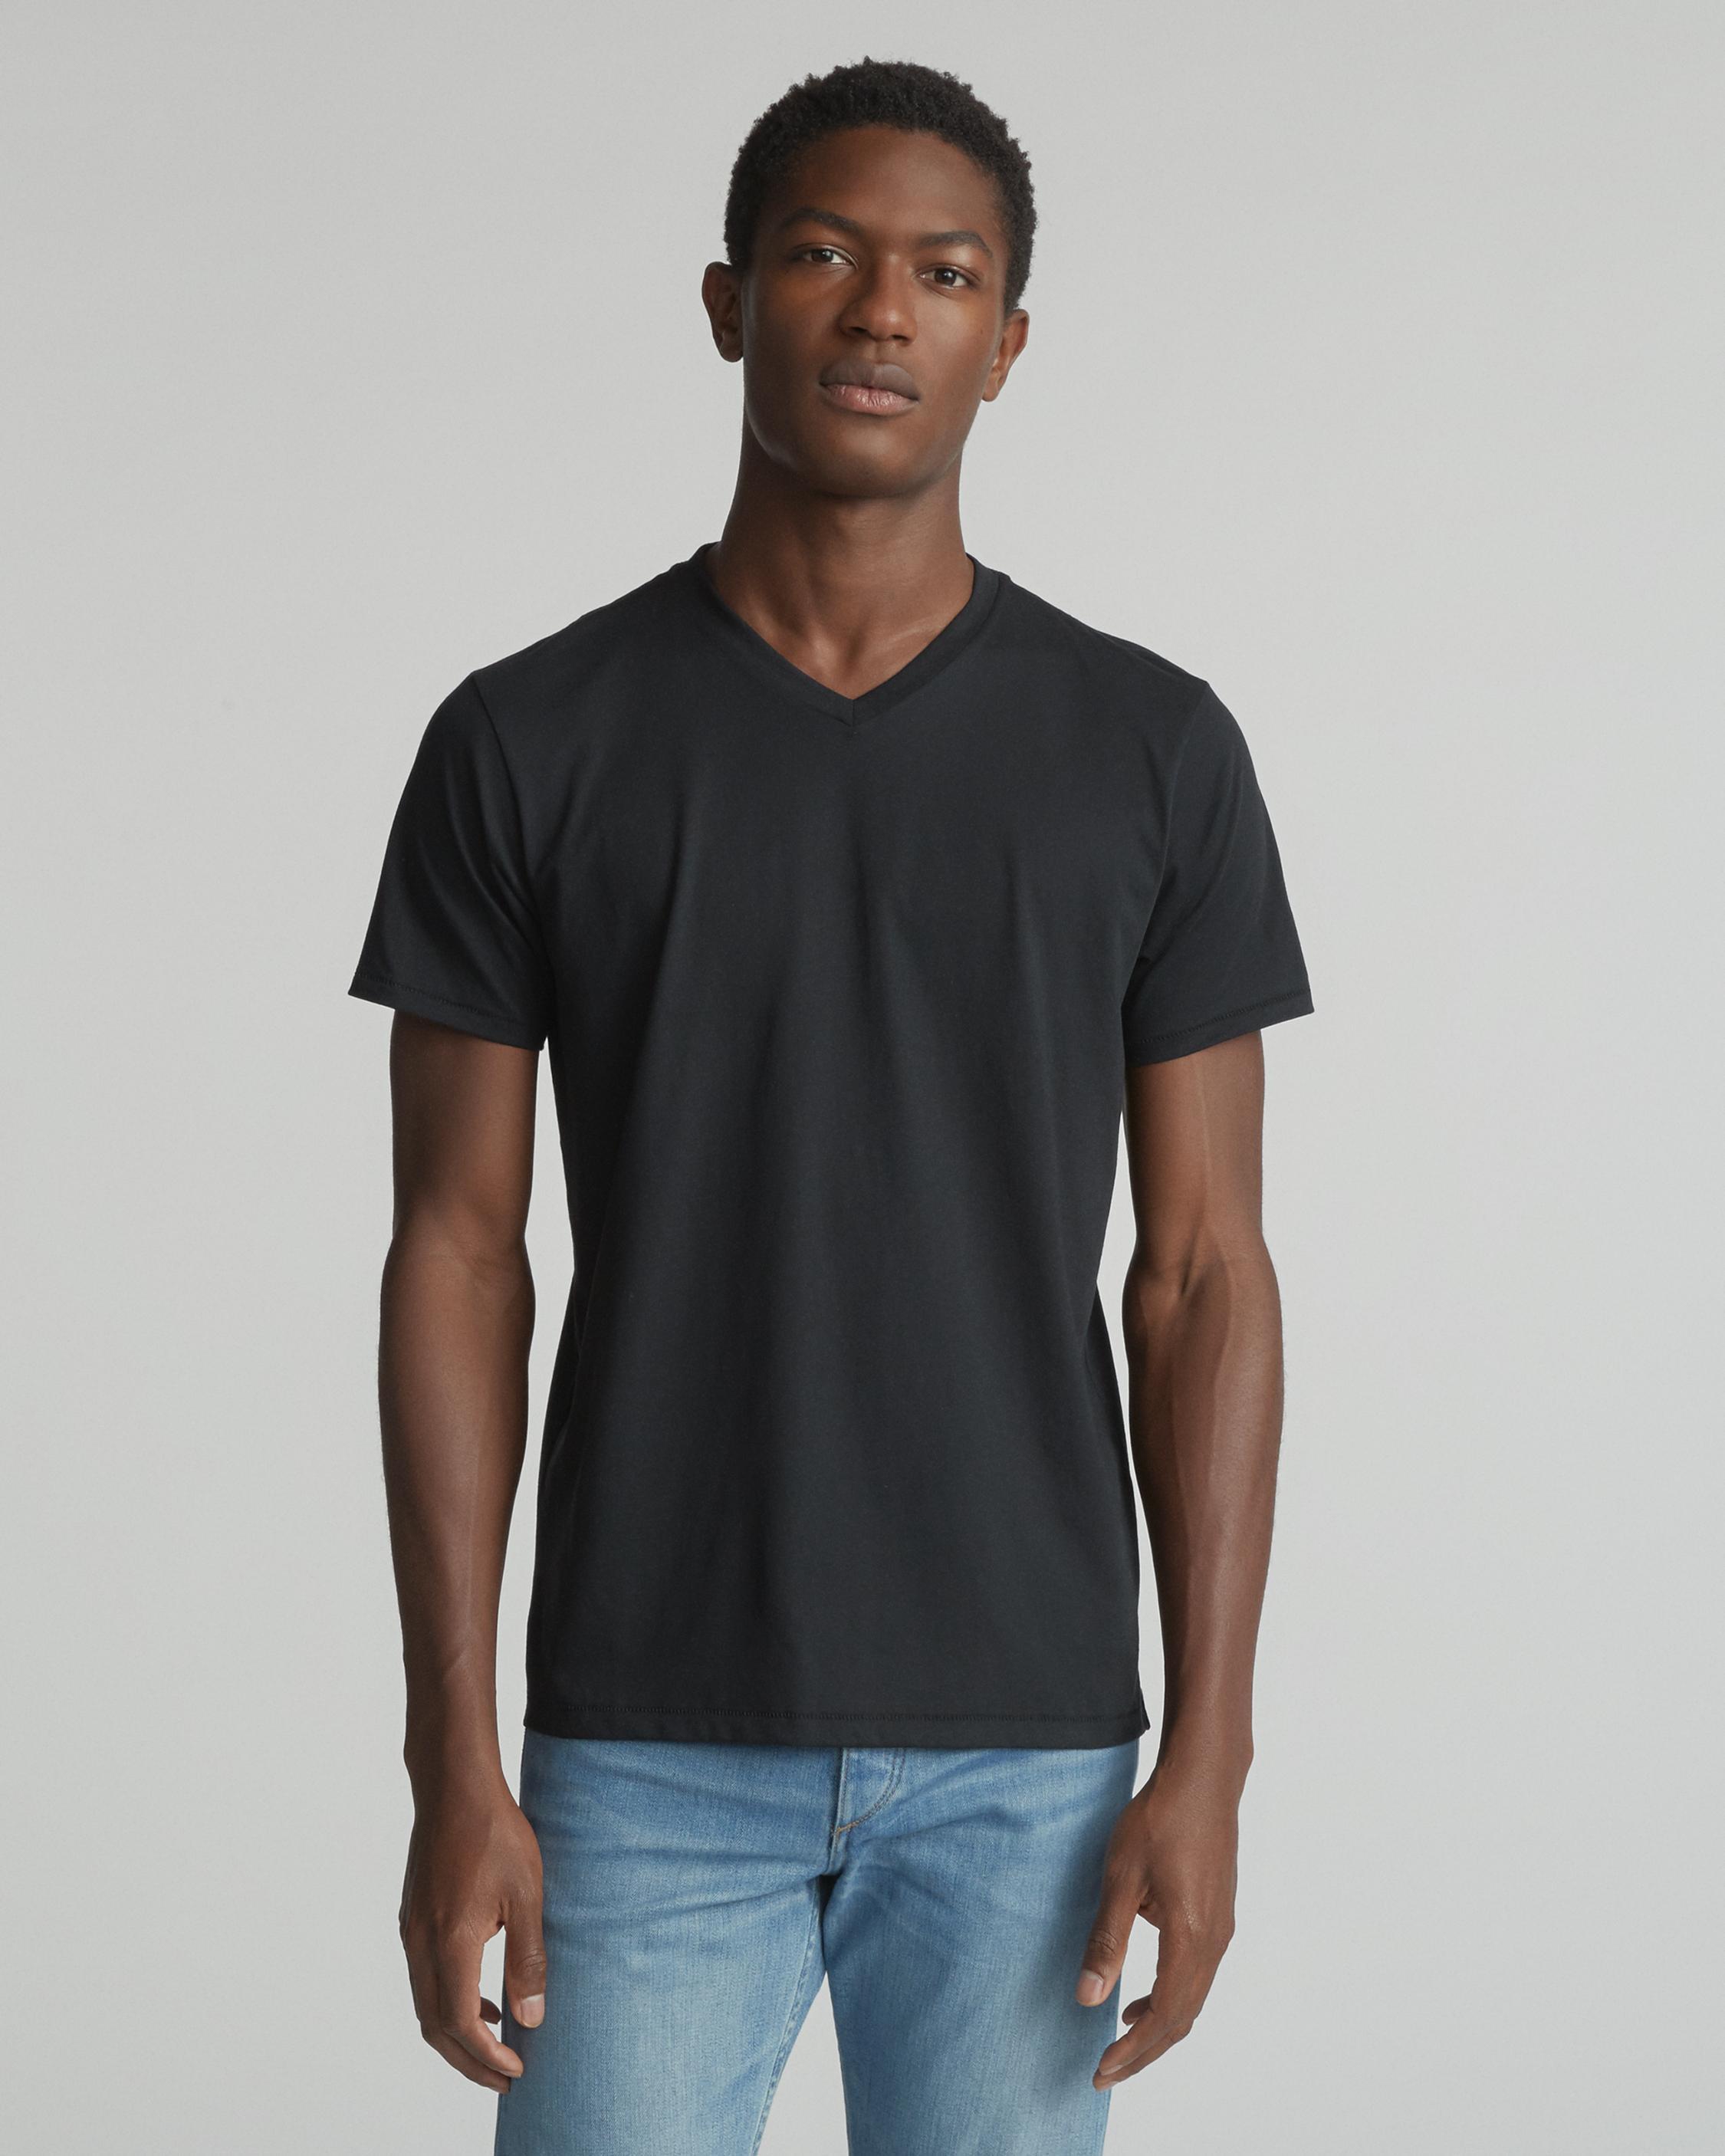 c7313a44 Classic Base V-neck Tee | Men Shirts | rag & bone